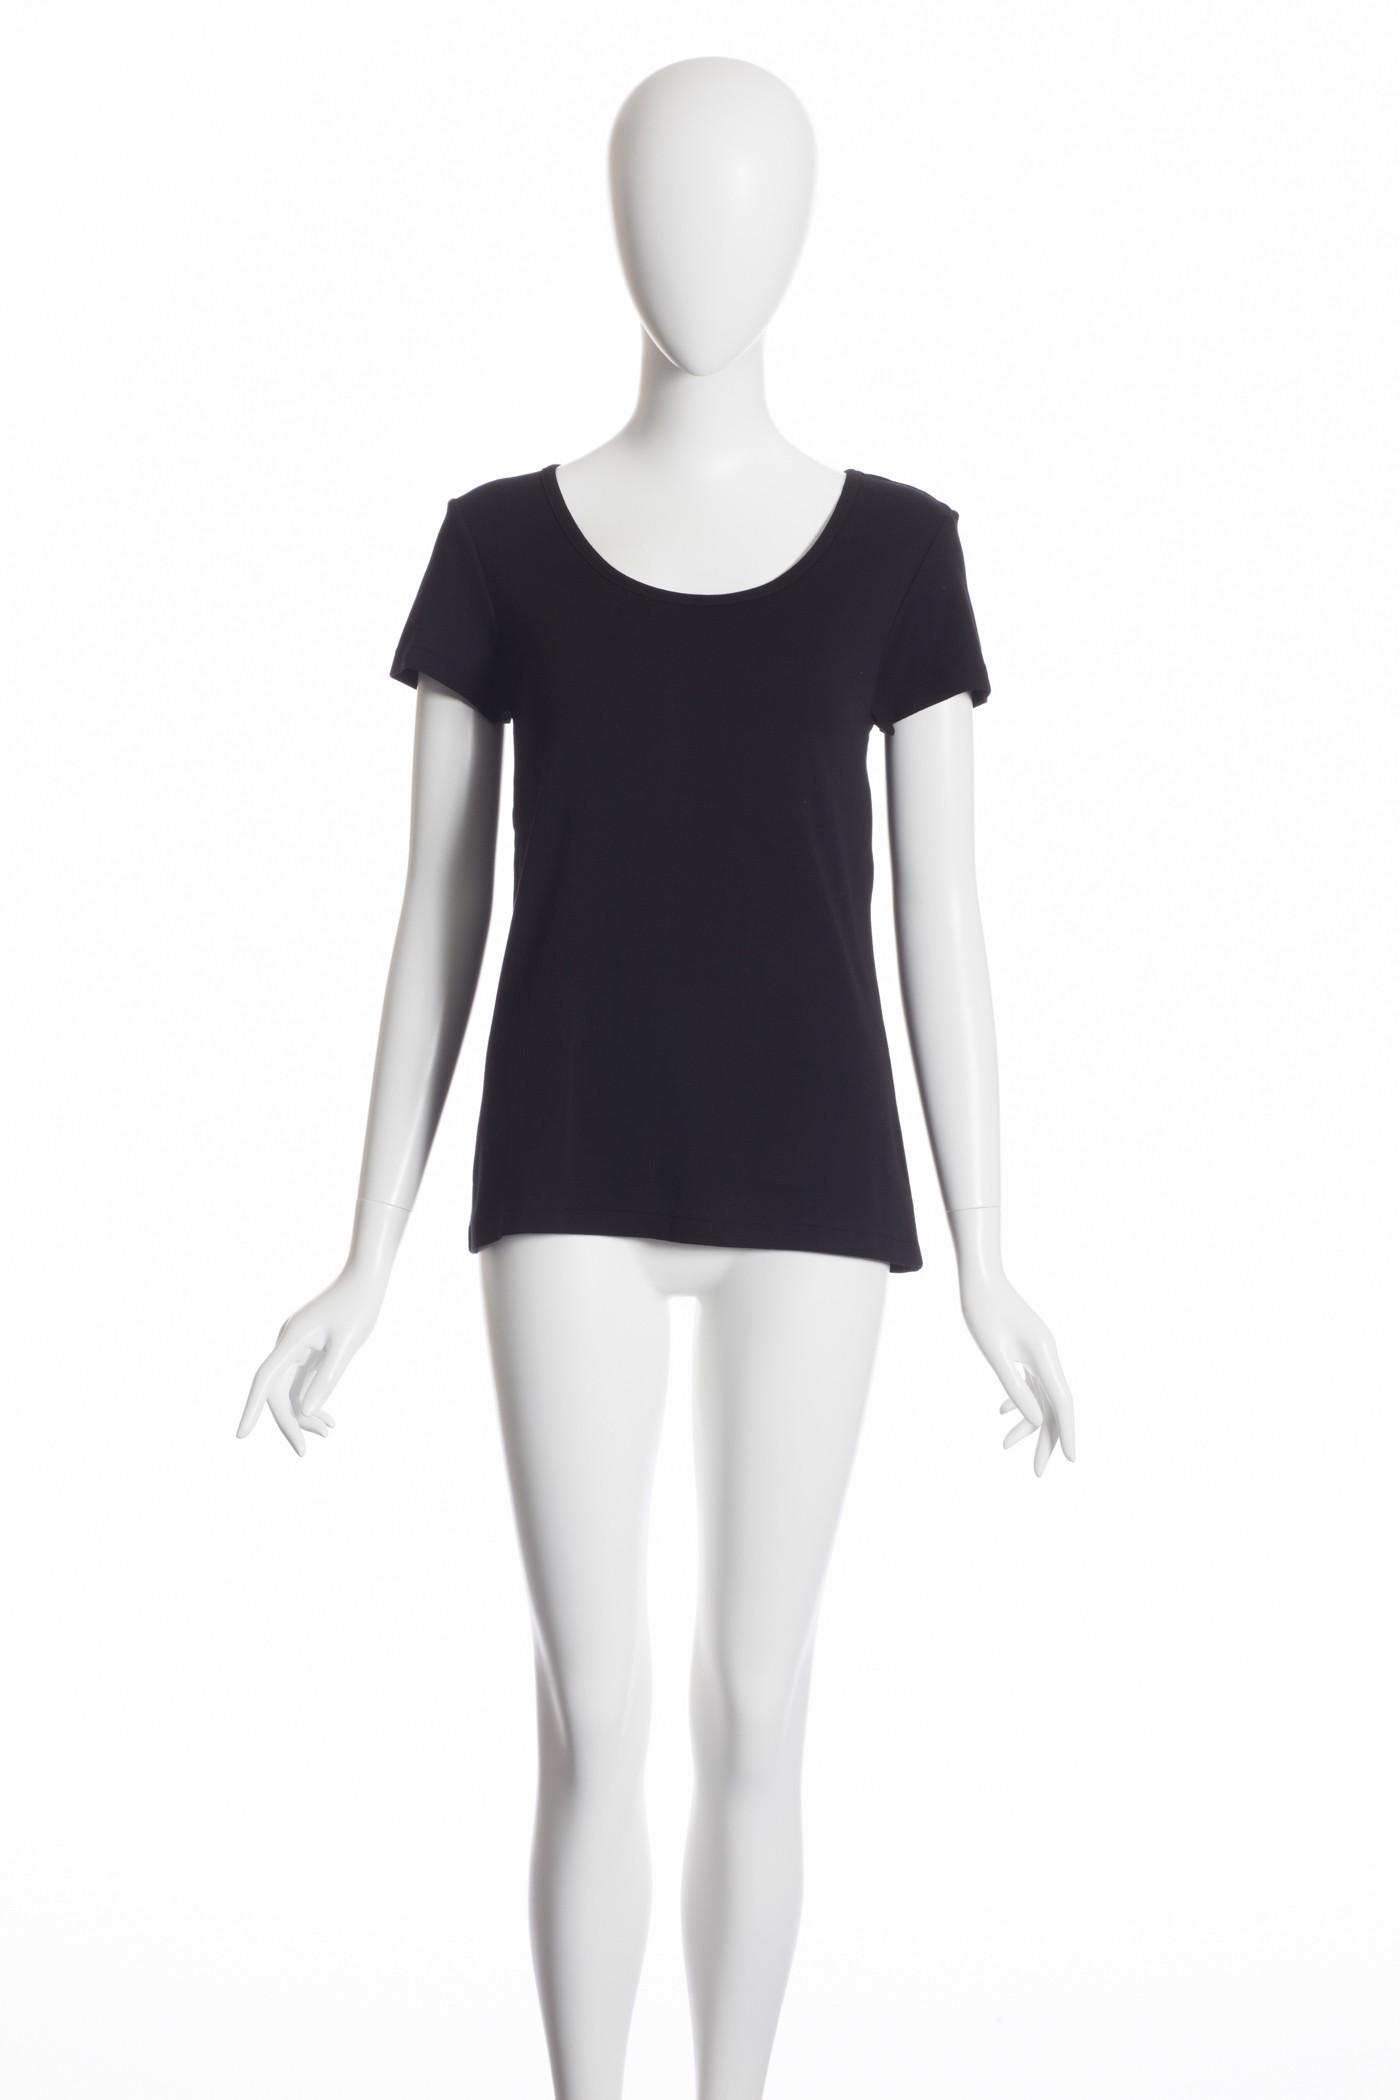 juno-s15-noir-cavadesoi_knitwear.jpg